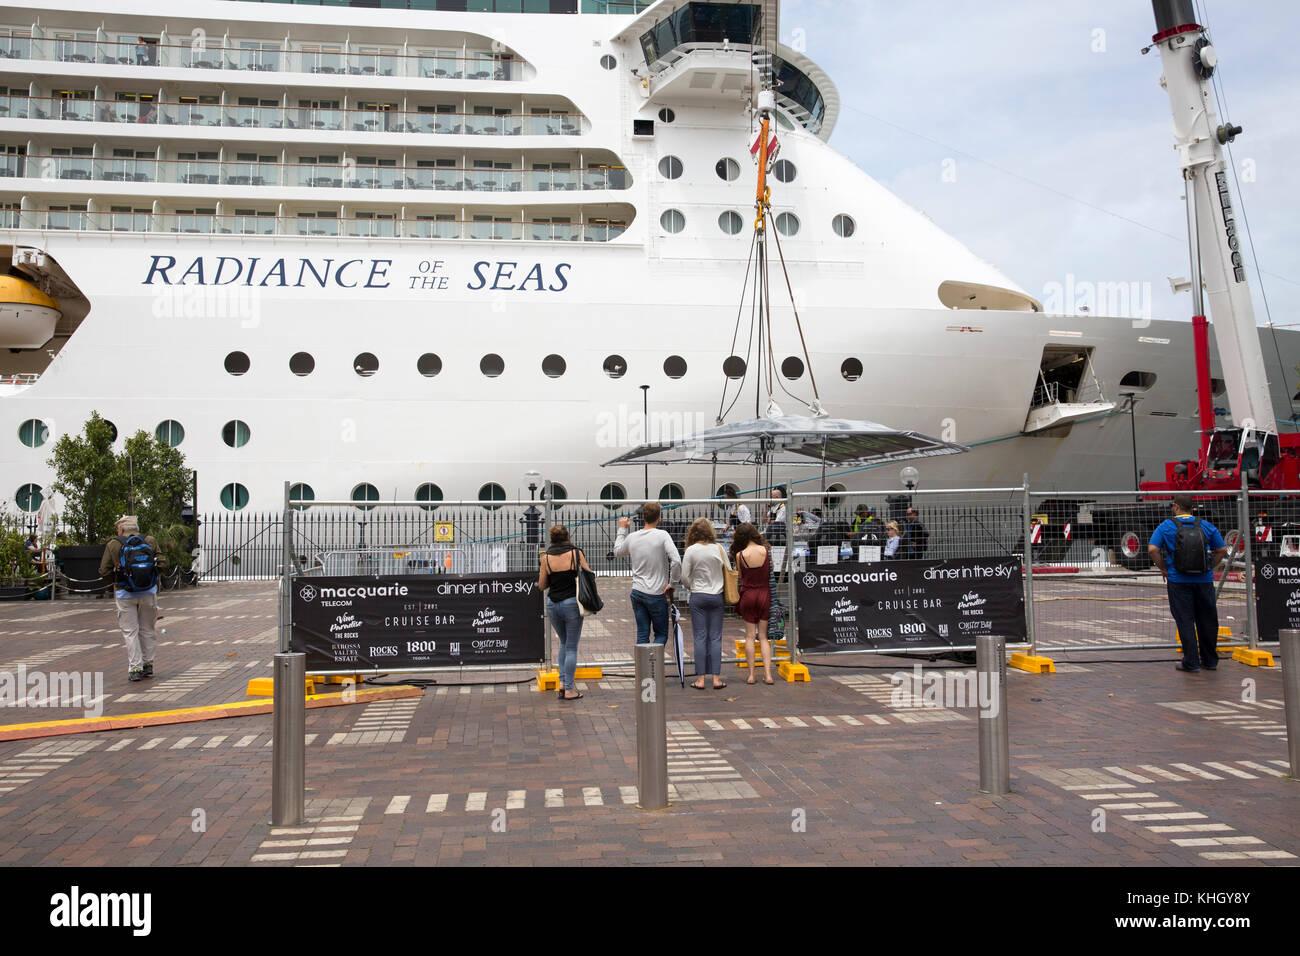 Sydney, Australia. 18th November, 2017. Radiance of the Seas cruise ship vessel moored at Sydney Overseas Passenger - Stock Image